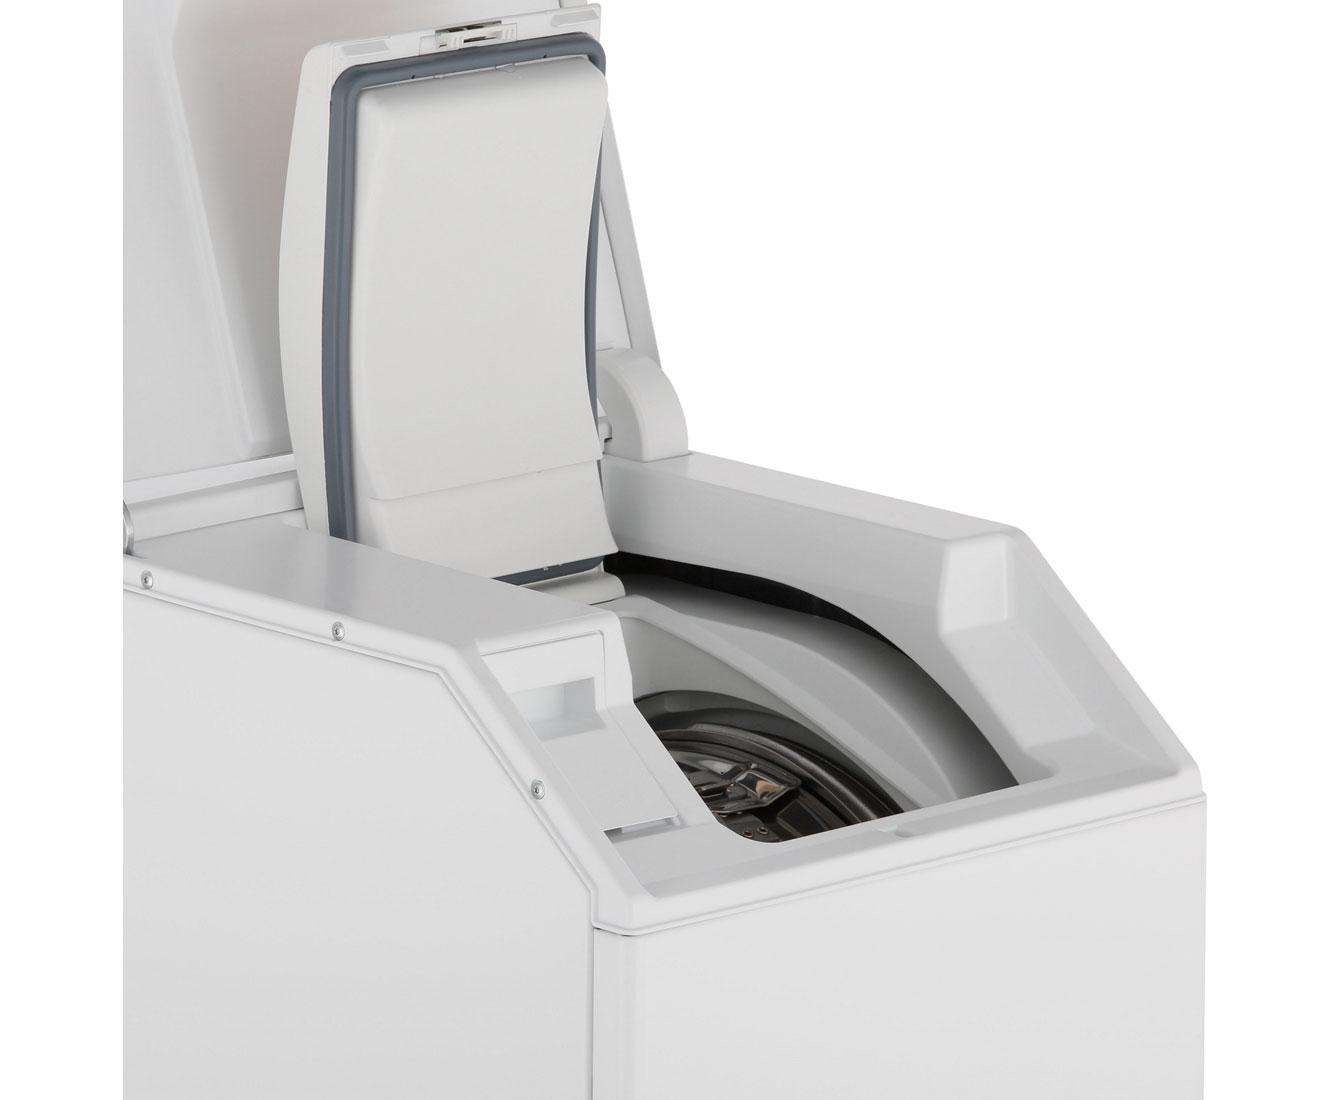 Miele w 668 f wpm waschmaschine toplader 6 kg 1200 u min a